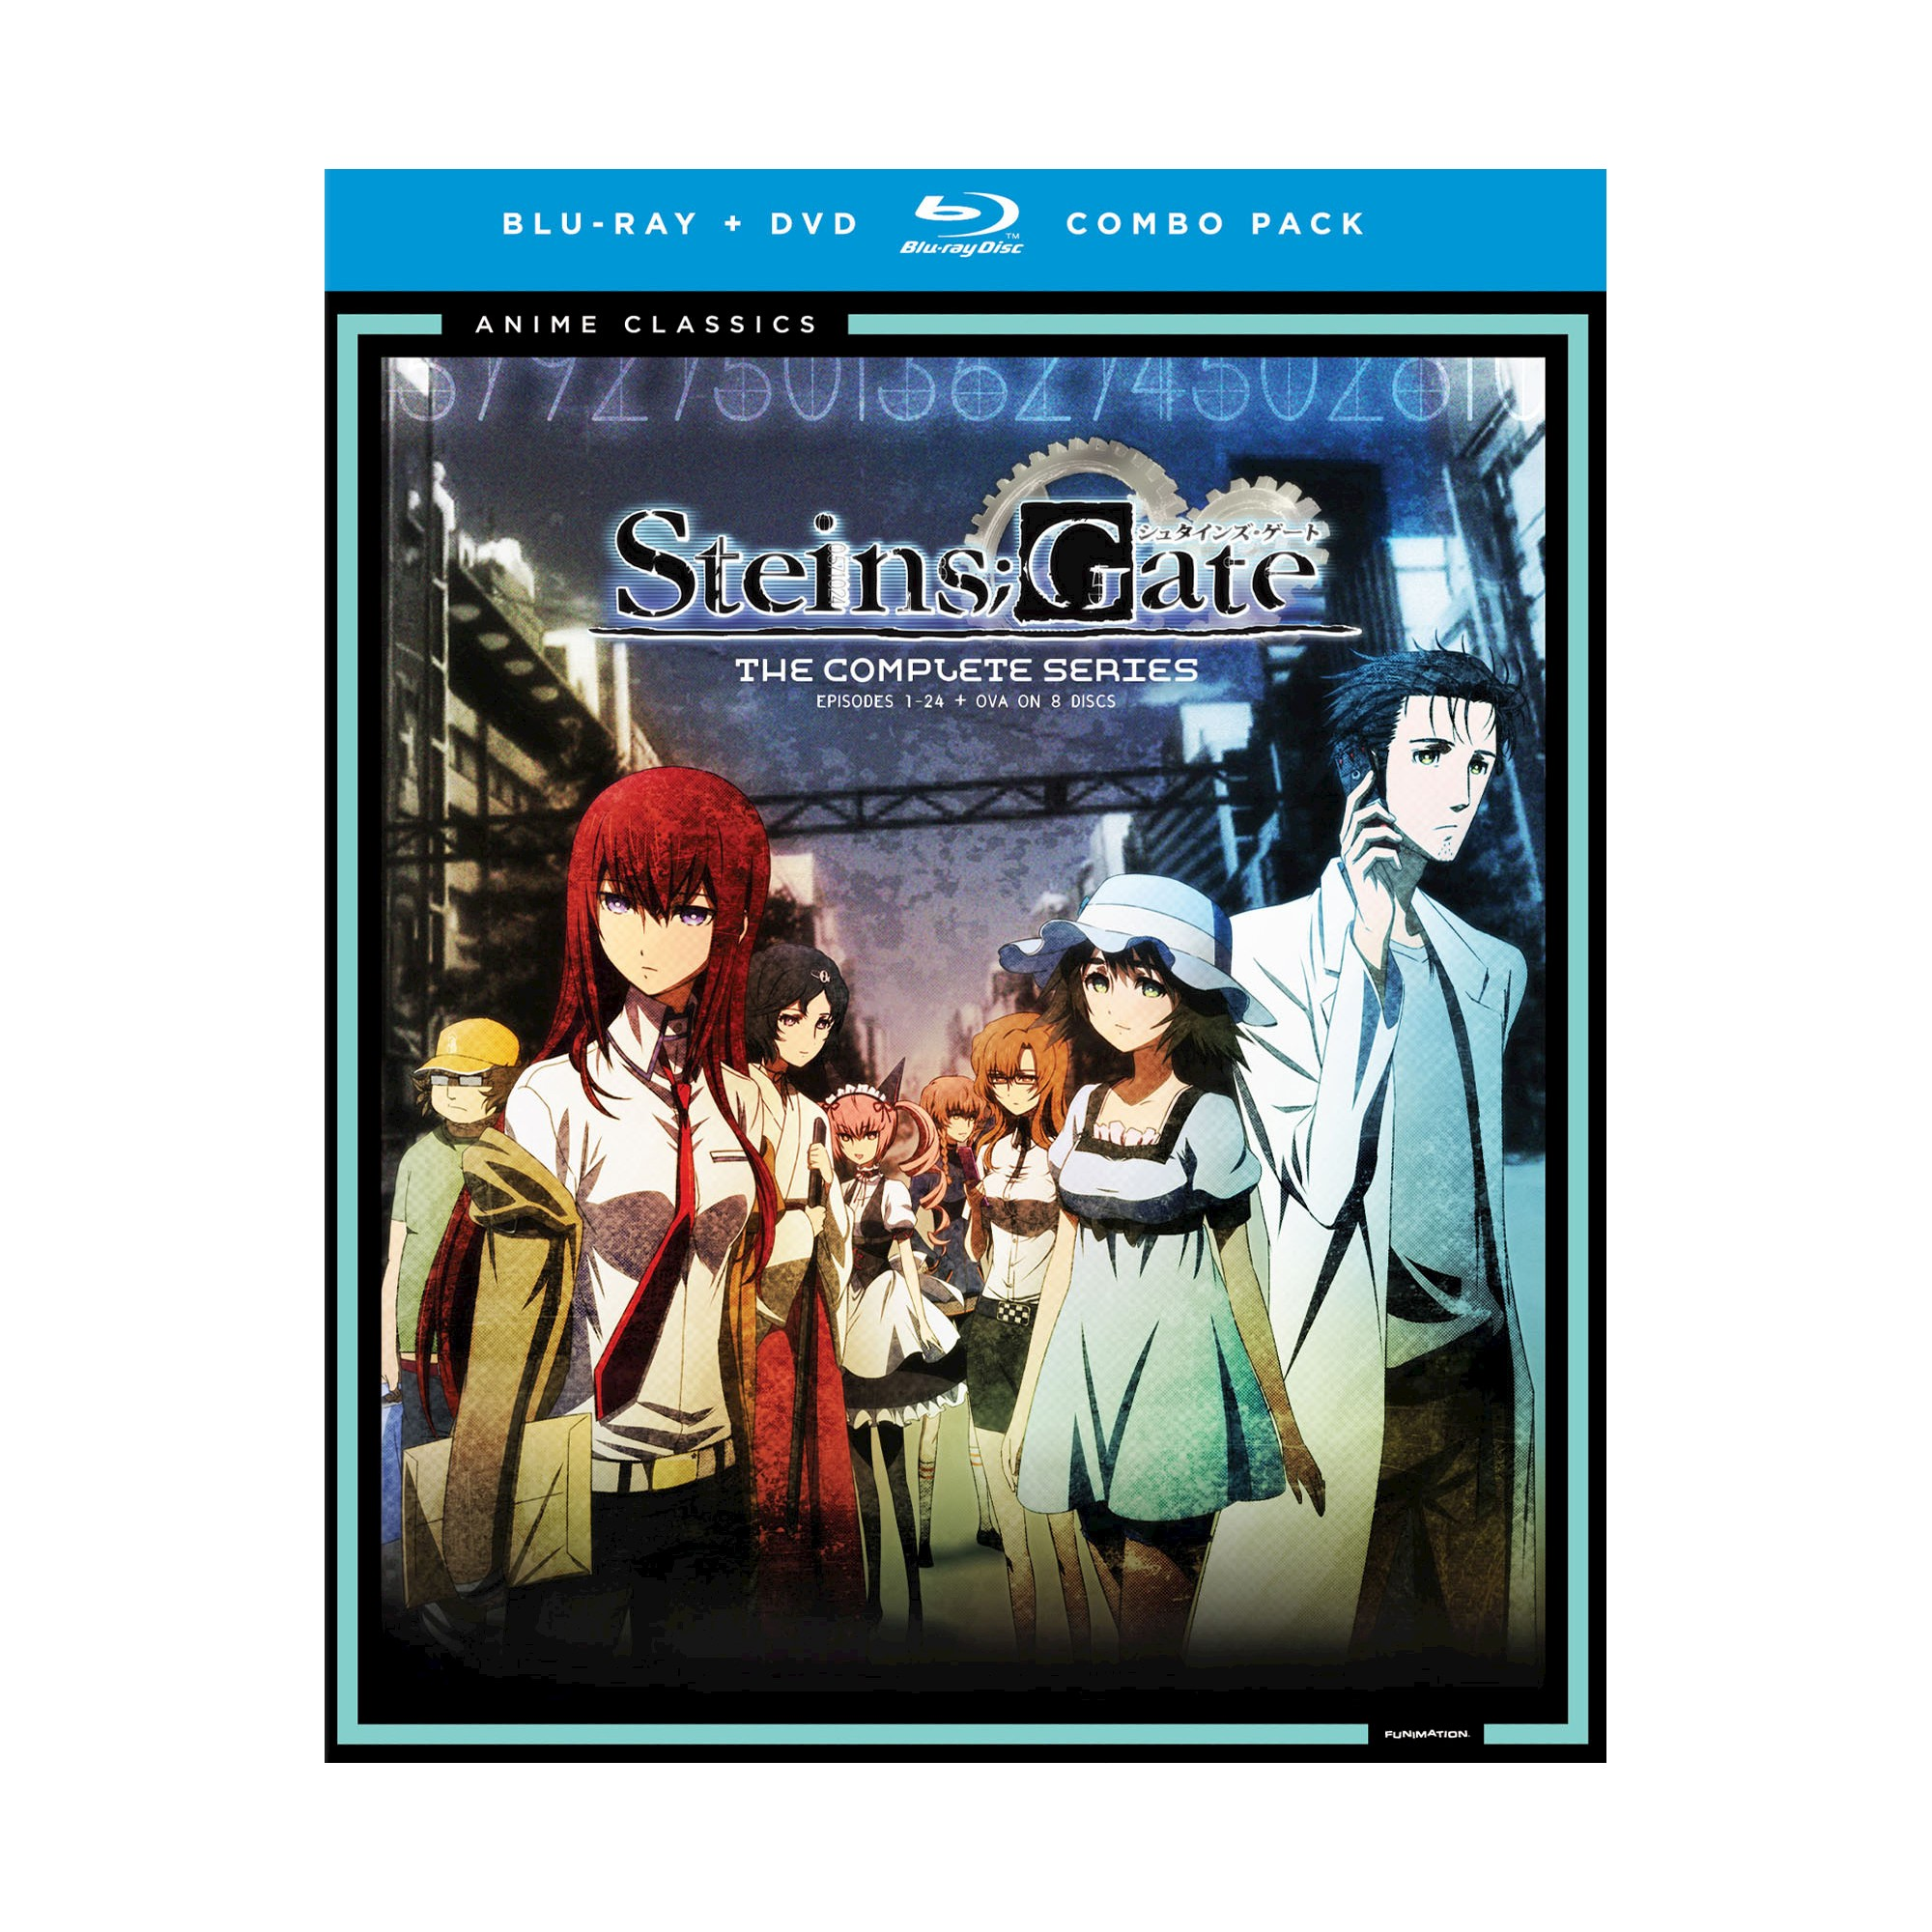 Steinsgate Complete Series Bd Dvd Co Blu Ray Steins Anime